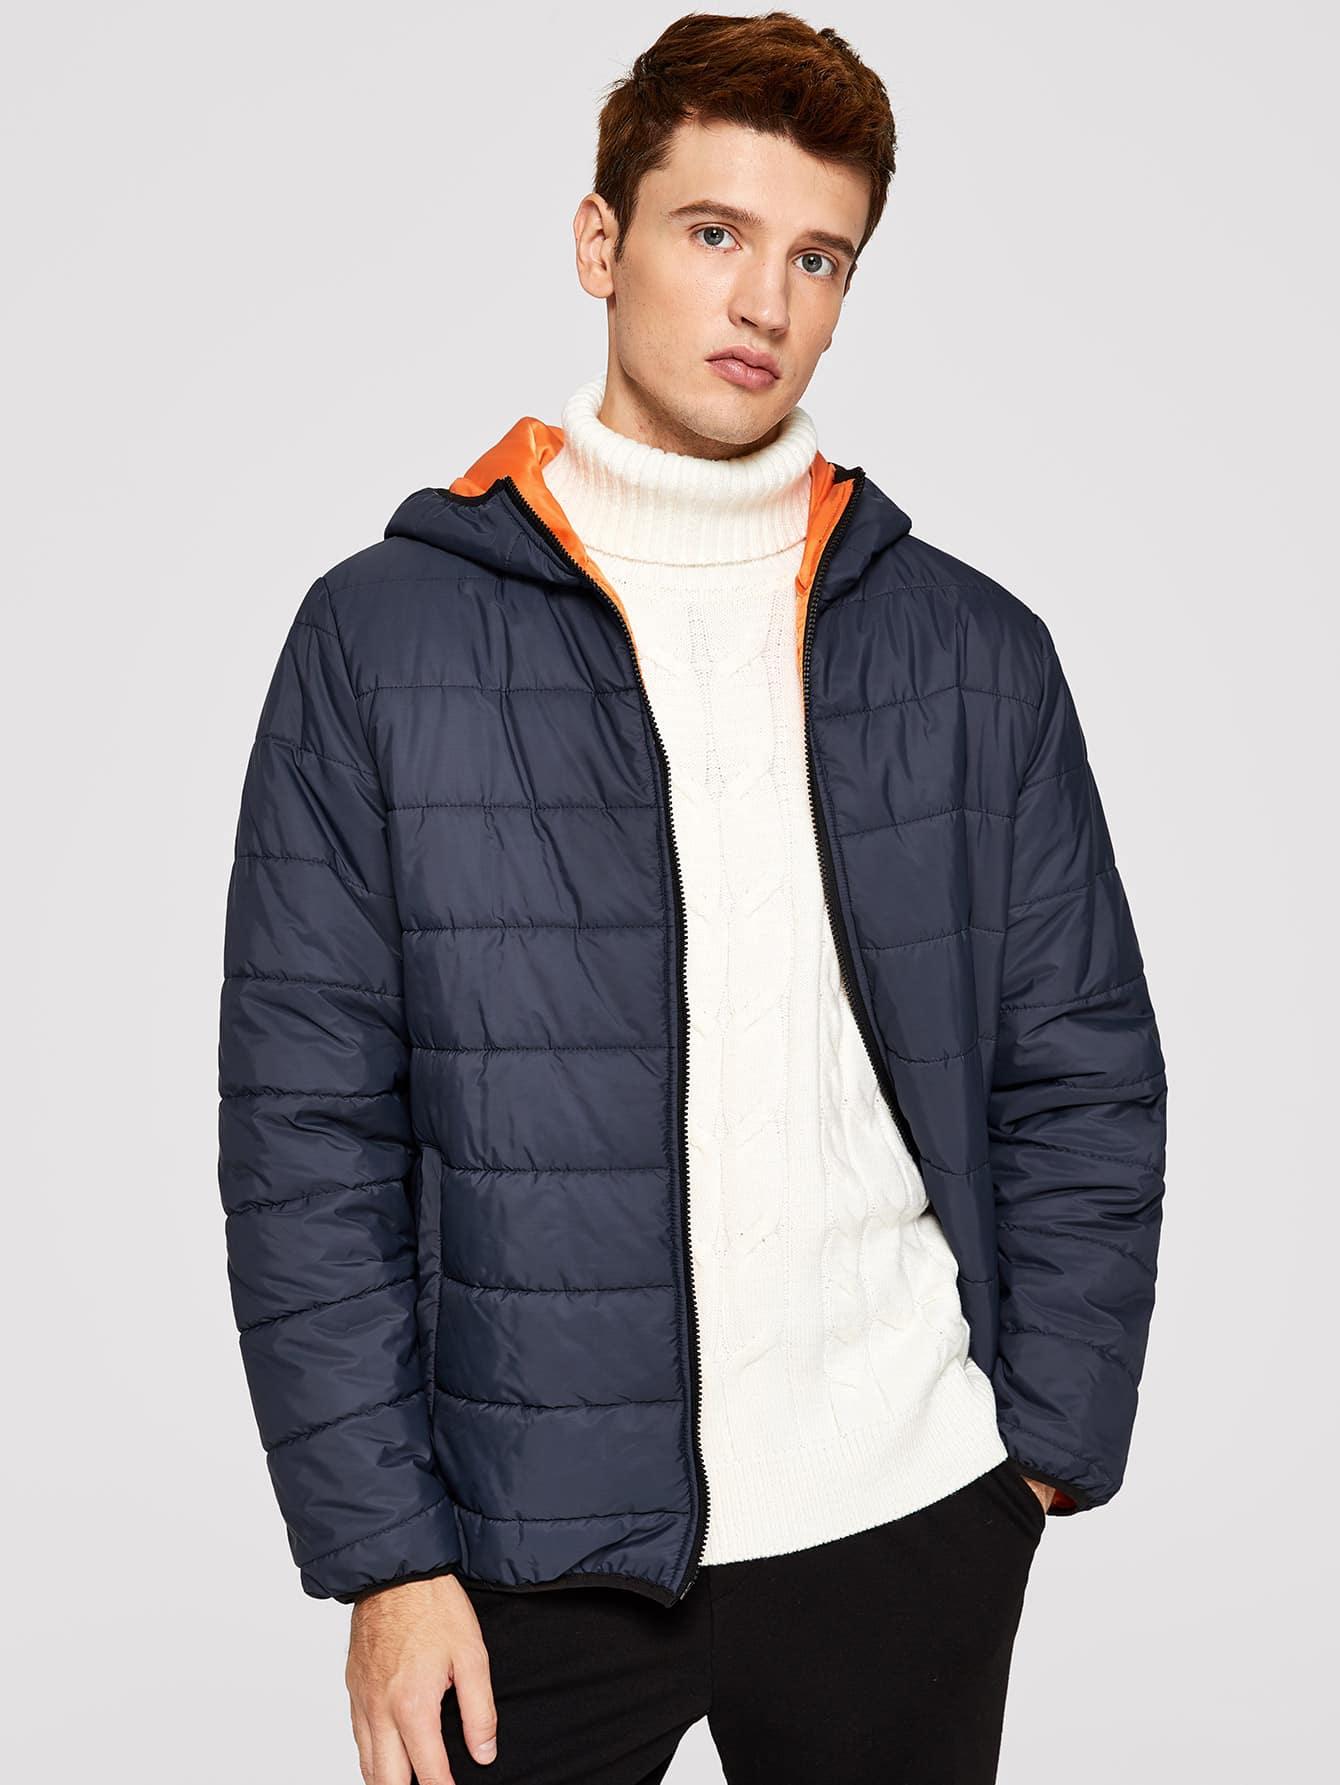 Фото - Ватная куртка с капюшоном для мужчин от SheIn цвет темно синий